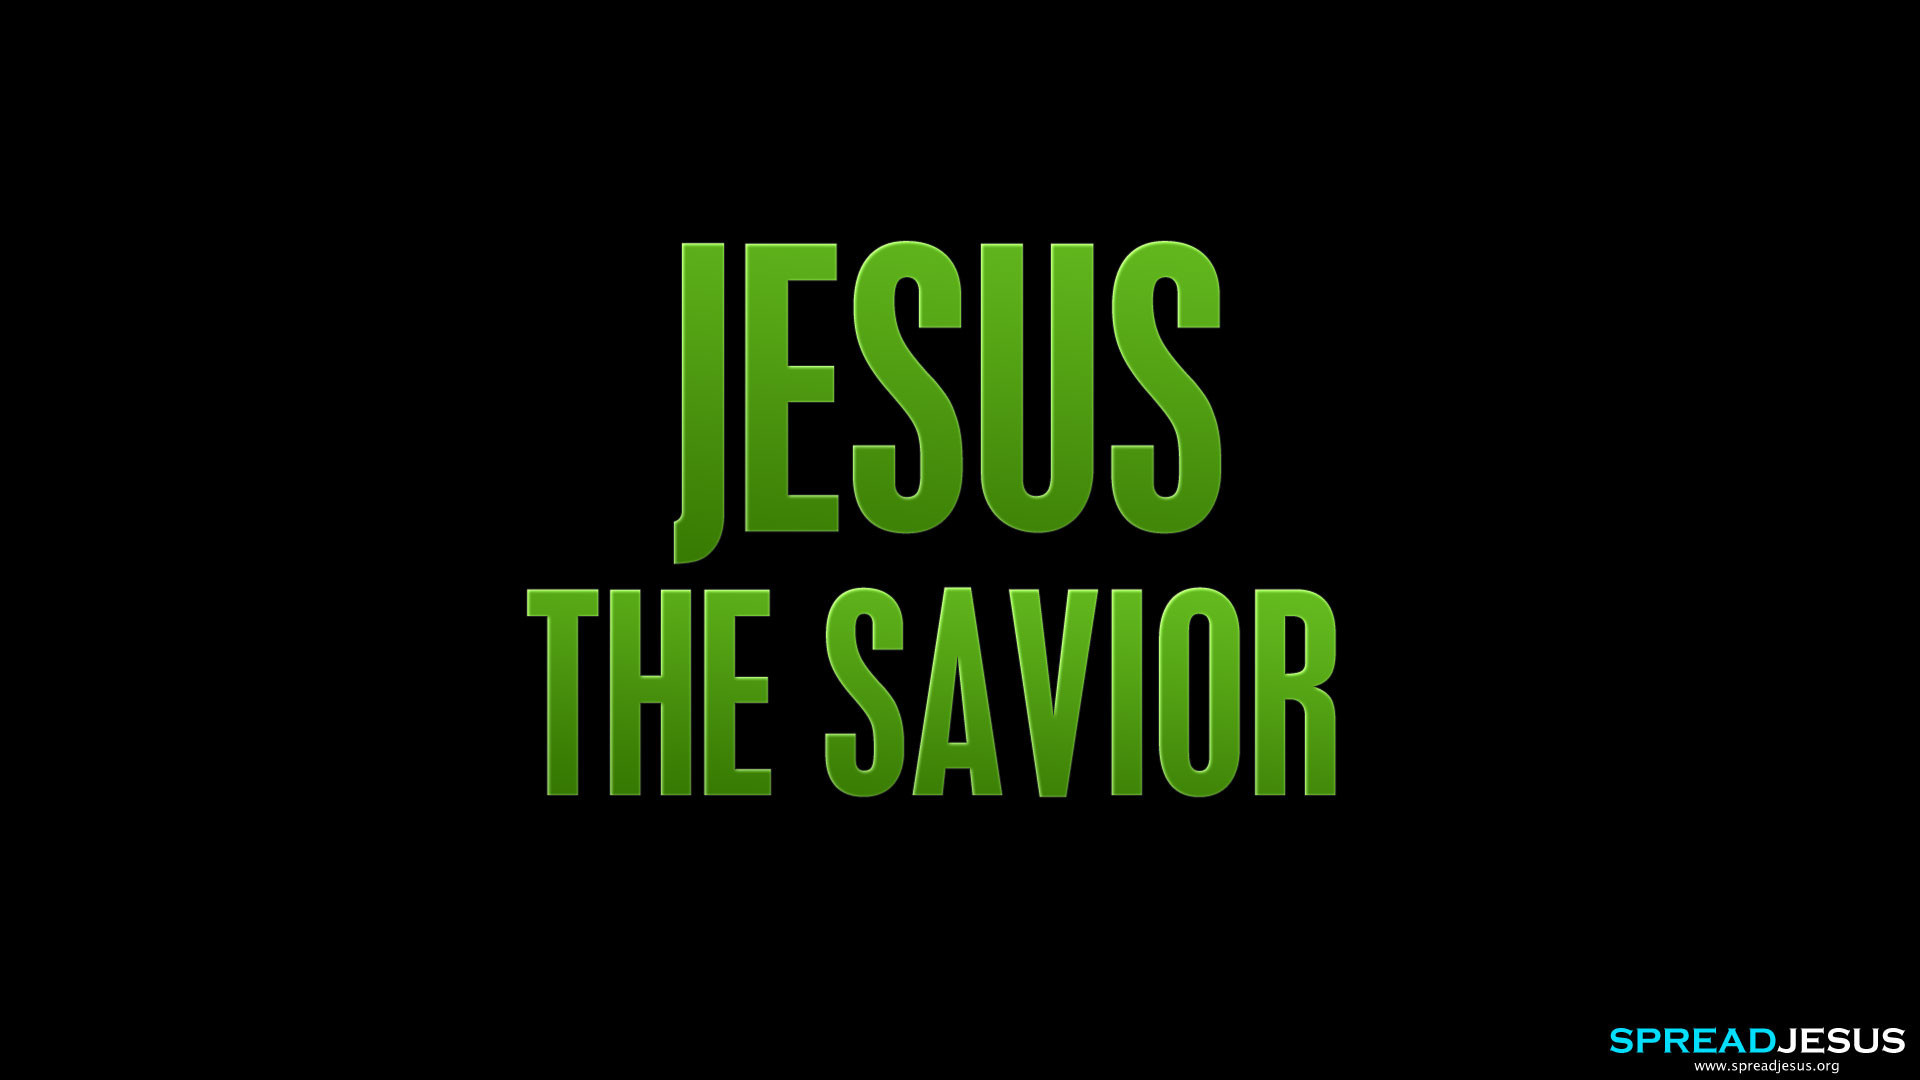 jesus-wallpapers-jesus-the-savior-wallpaper-Hd-jesus-